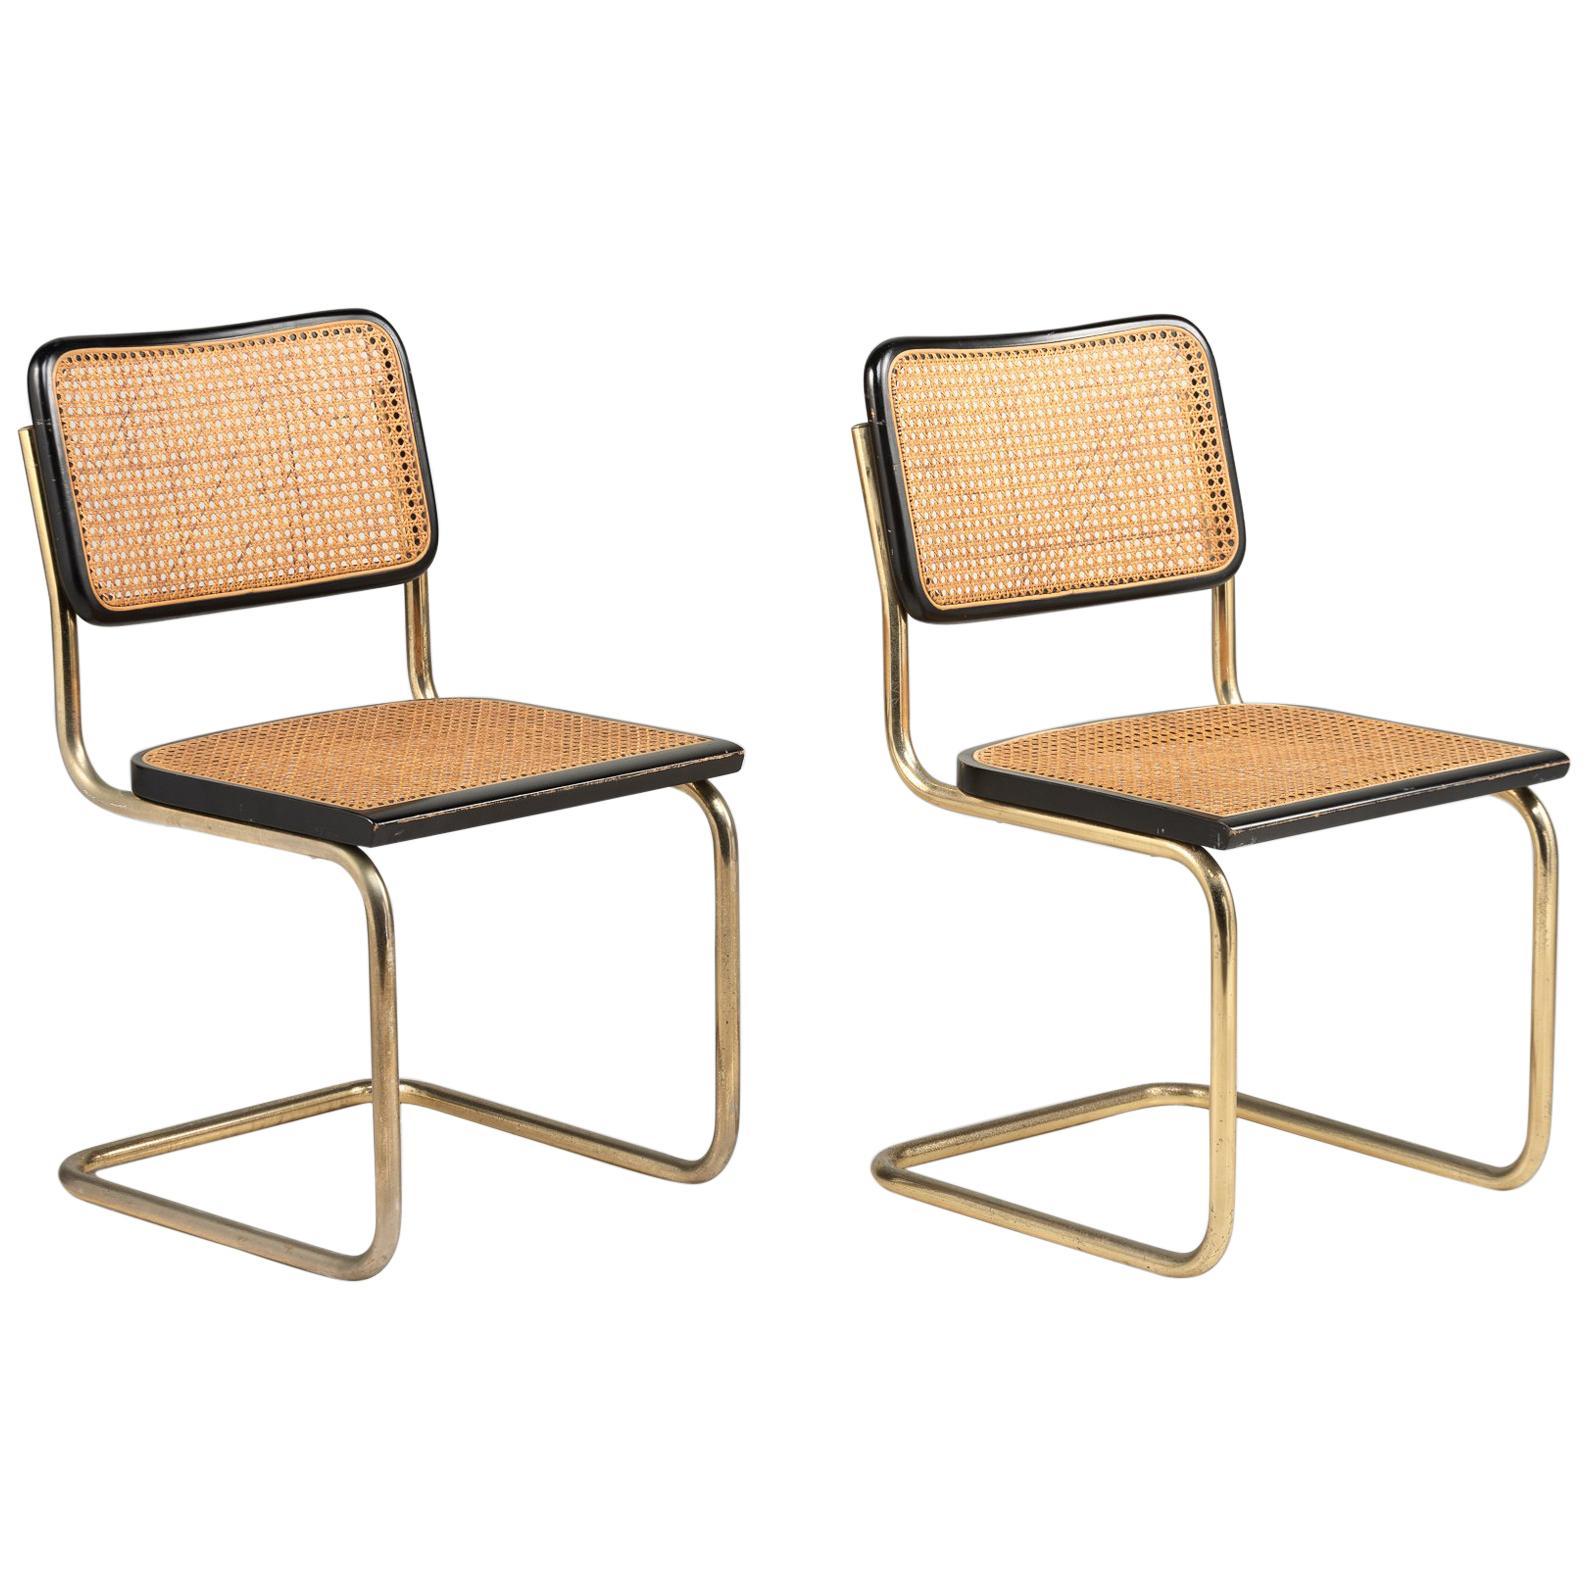 Rare Gilt Metal Cantilever Chairs by Marcel Breuer circa 1928  sc 1 st  1stDibs & Bryn Mawr